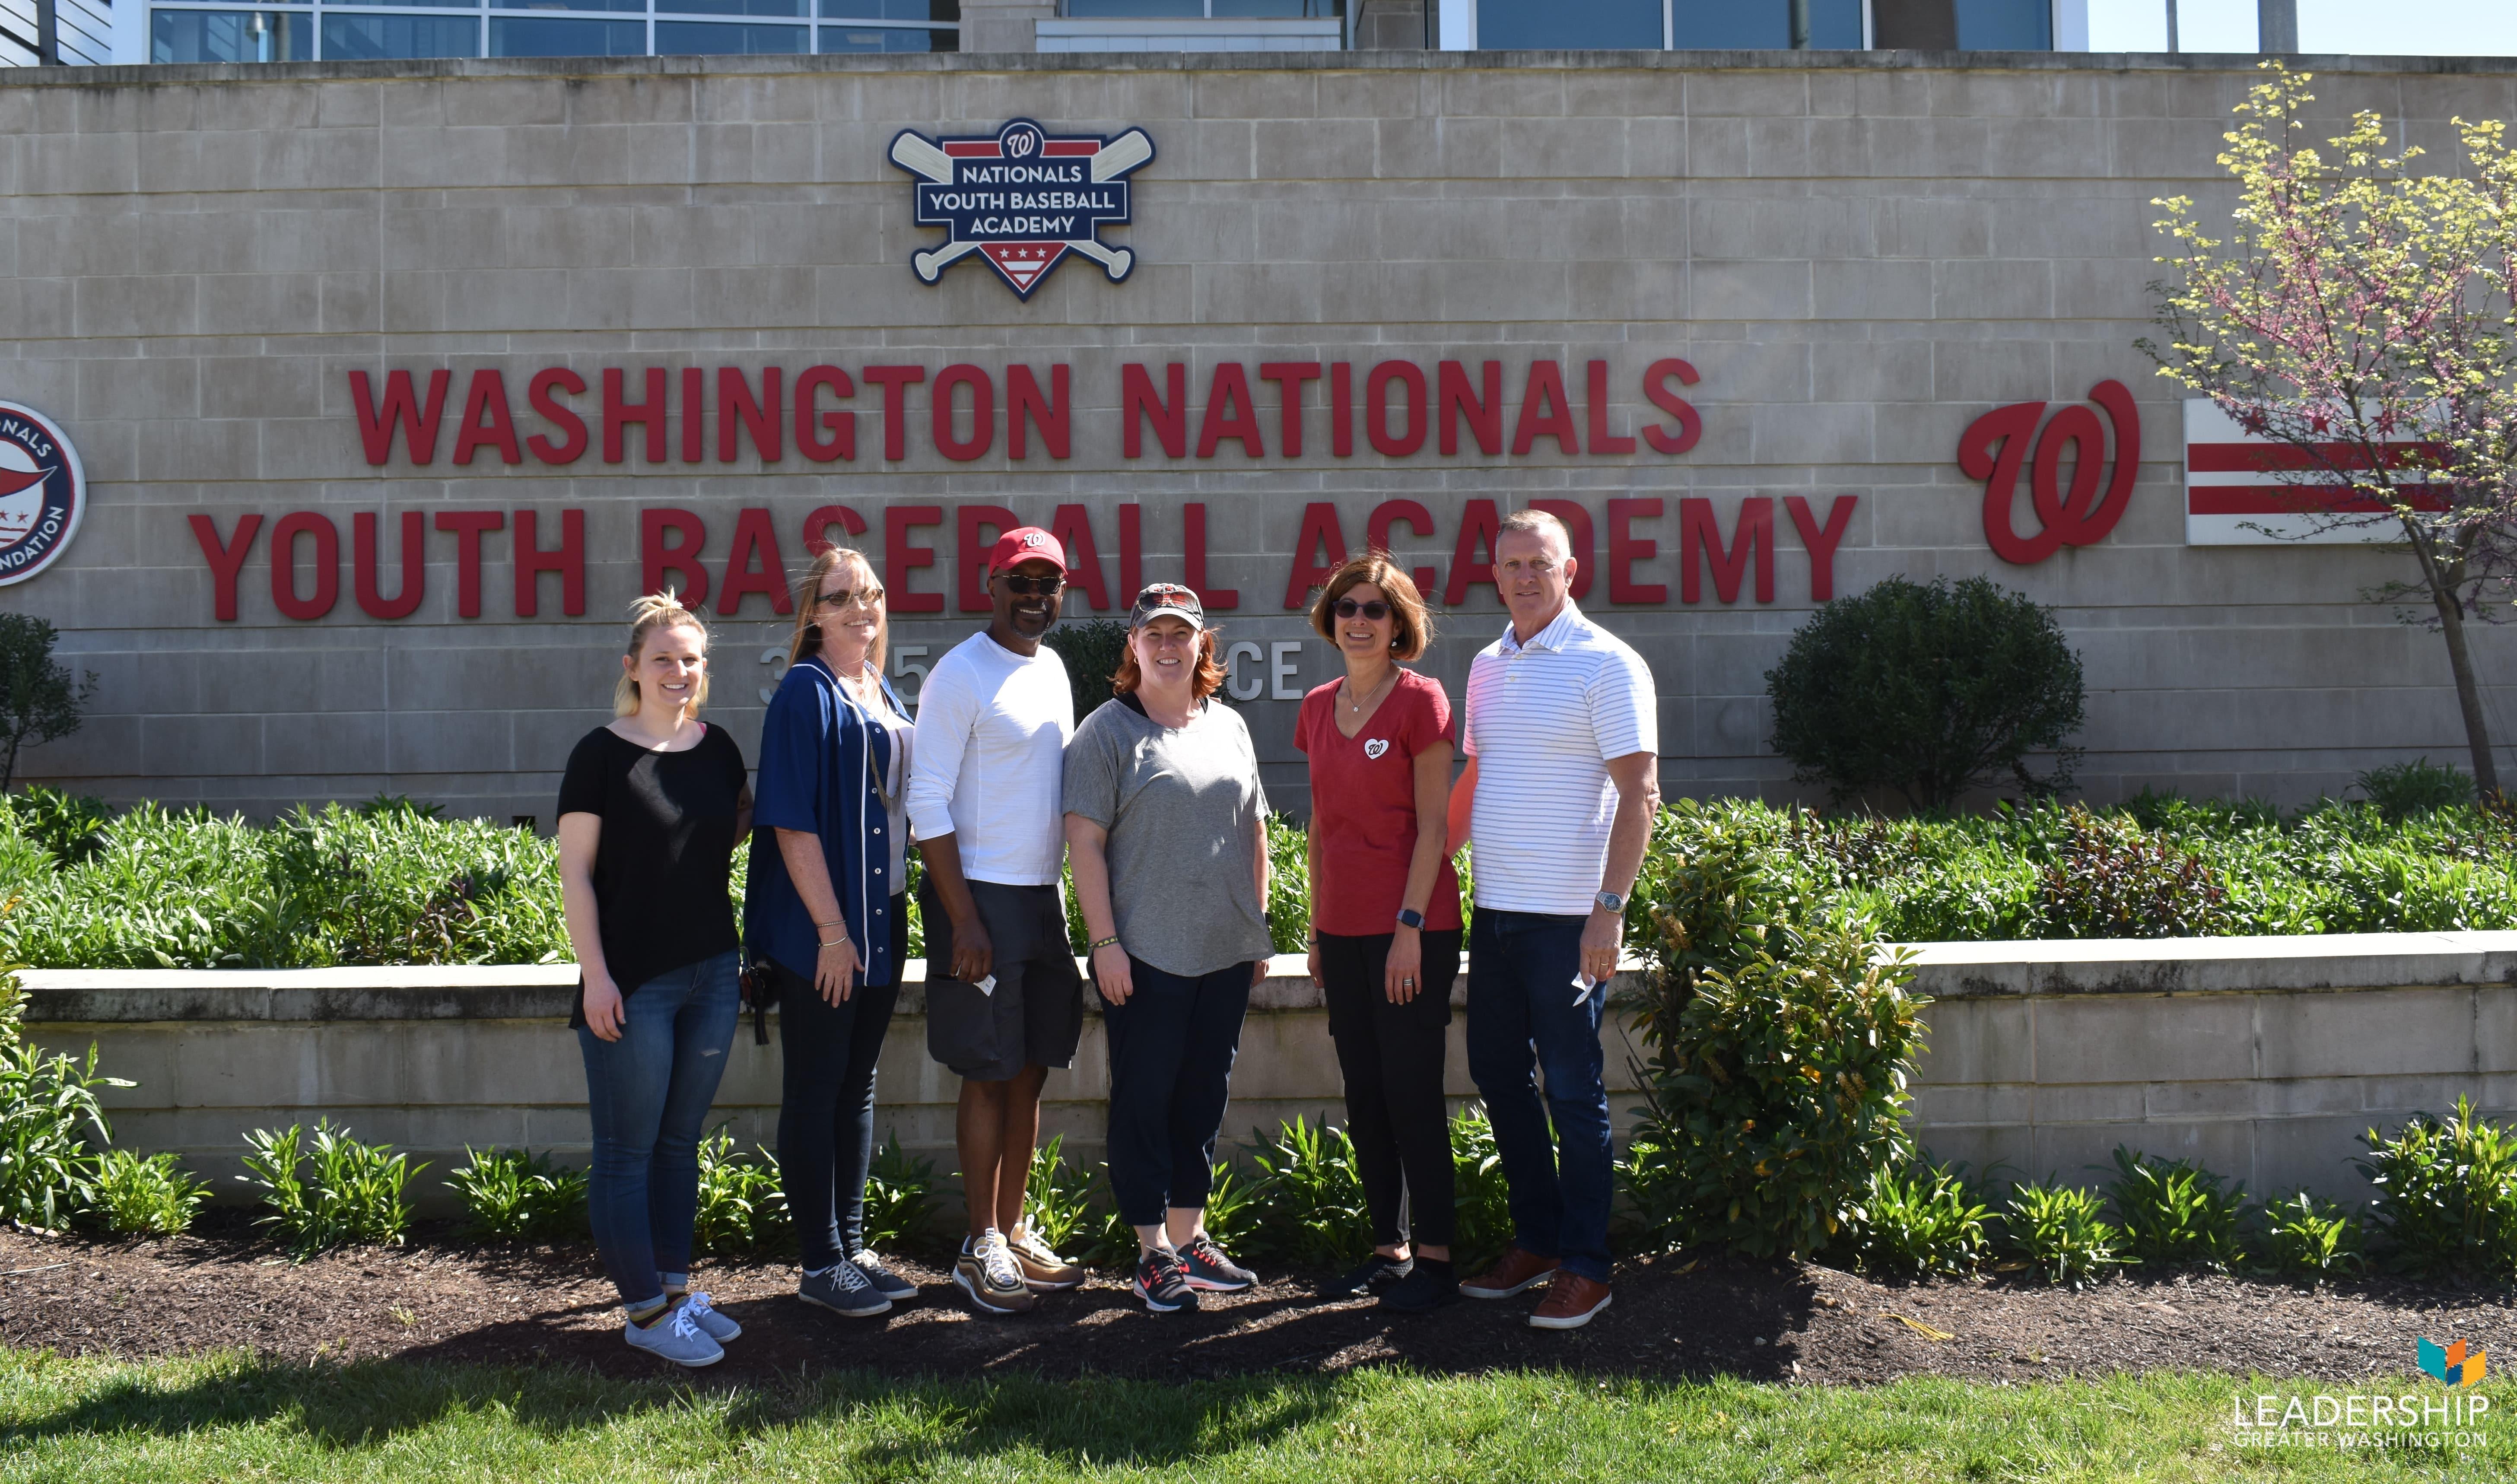 Leadership Greater Washington volunteers at Washington Nationals Youth Baseball Academy